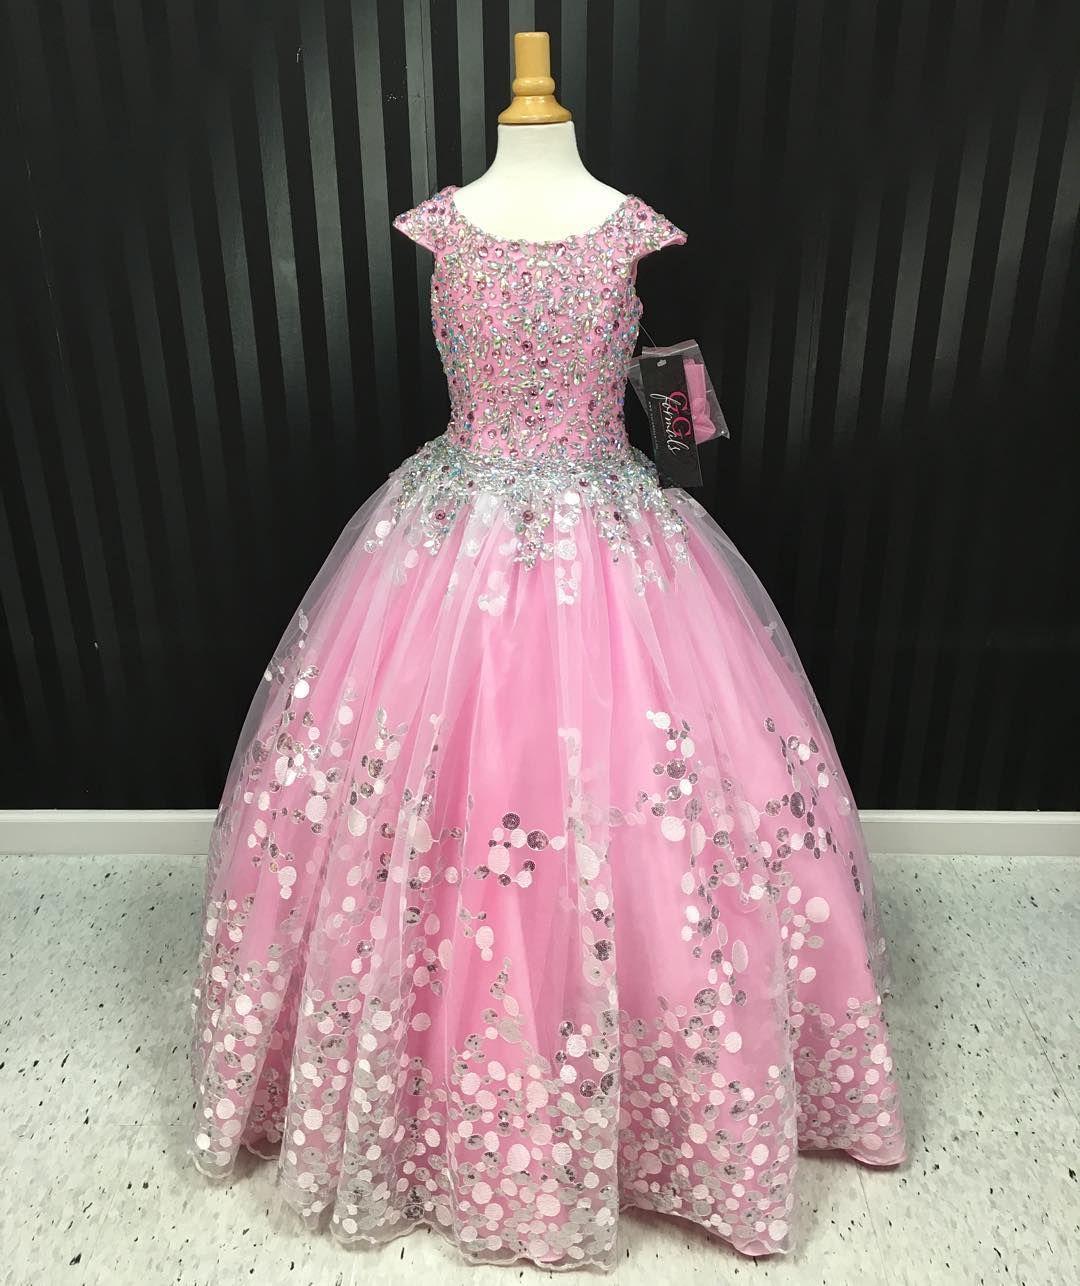 Pin de Lena Dress en sasho | Pinterest | Niño hermoso, Vestido de ...